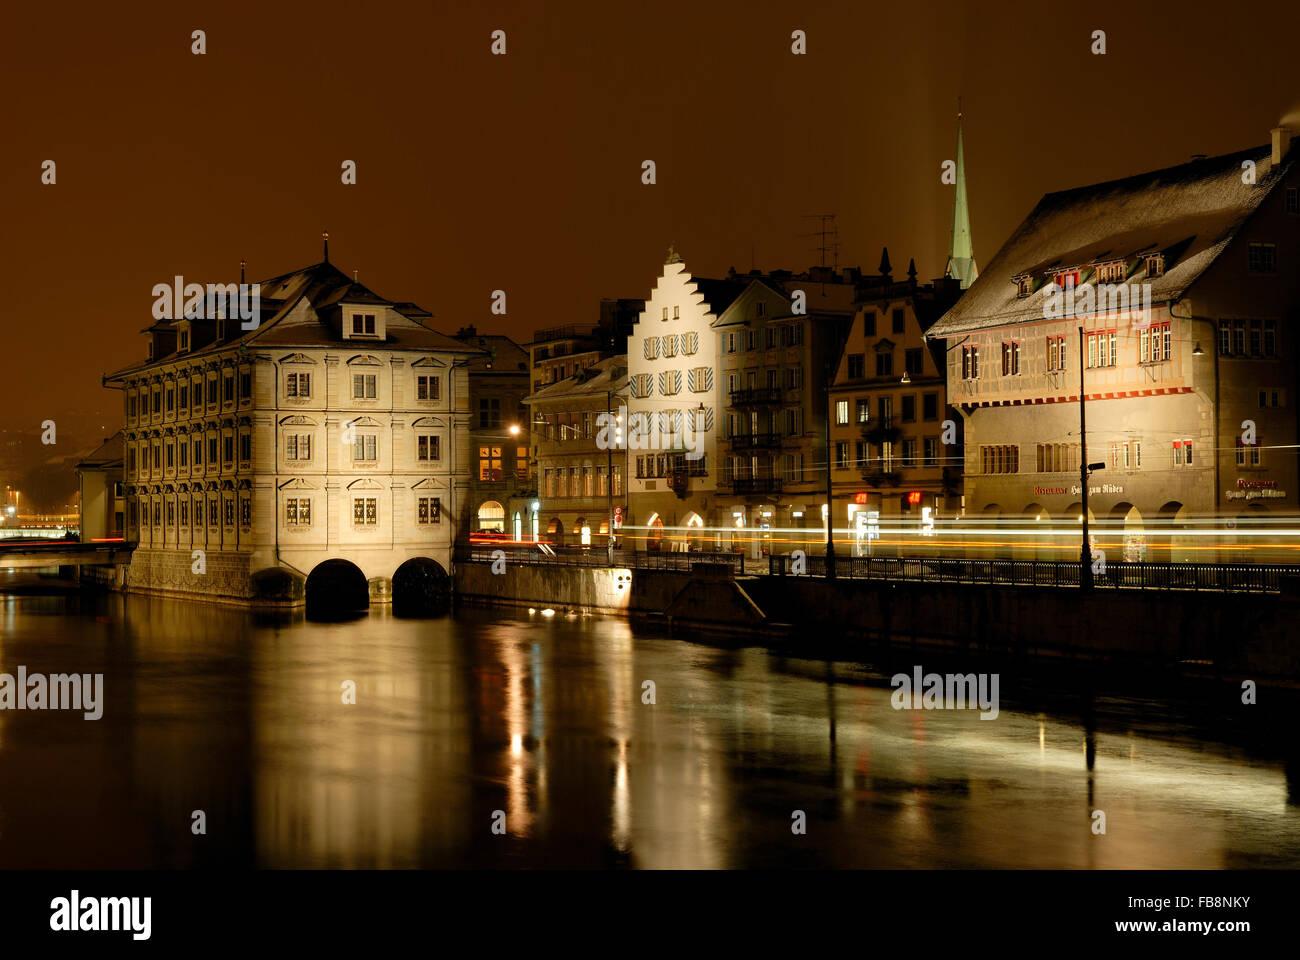 Rathaus and Limmatquai, Zurich, Switzerland - Stock Image